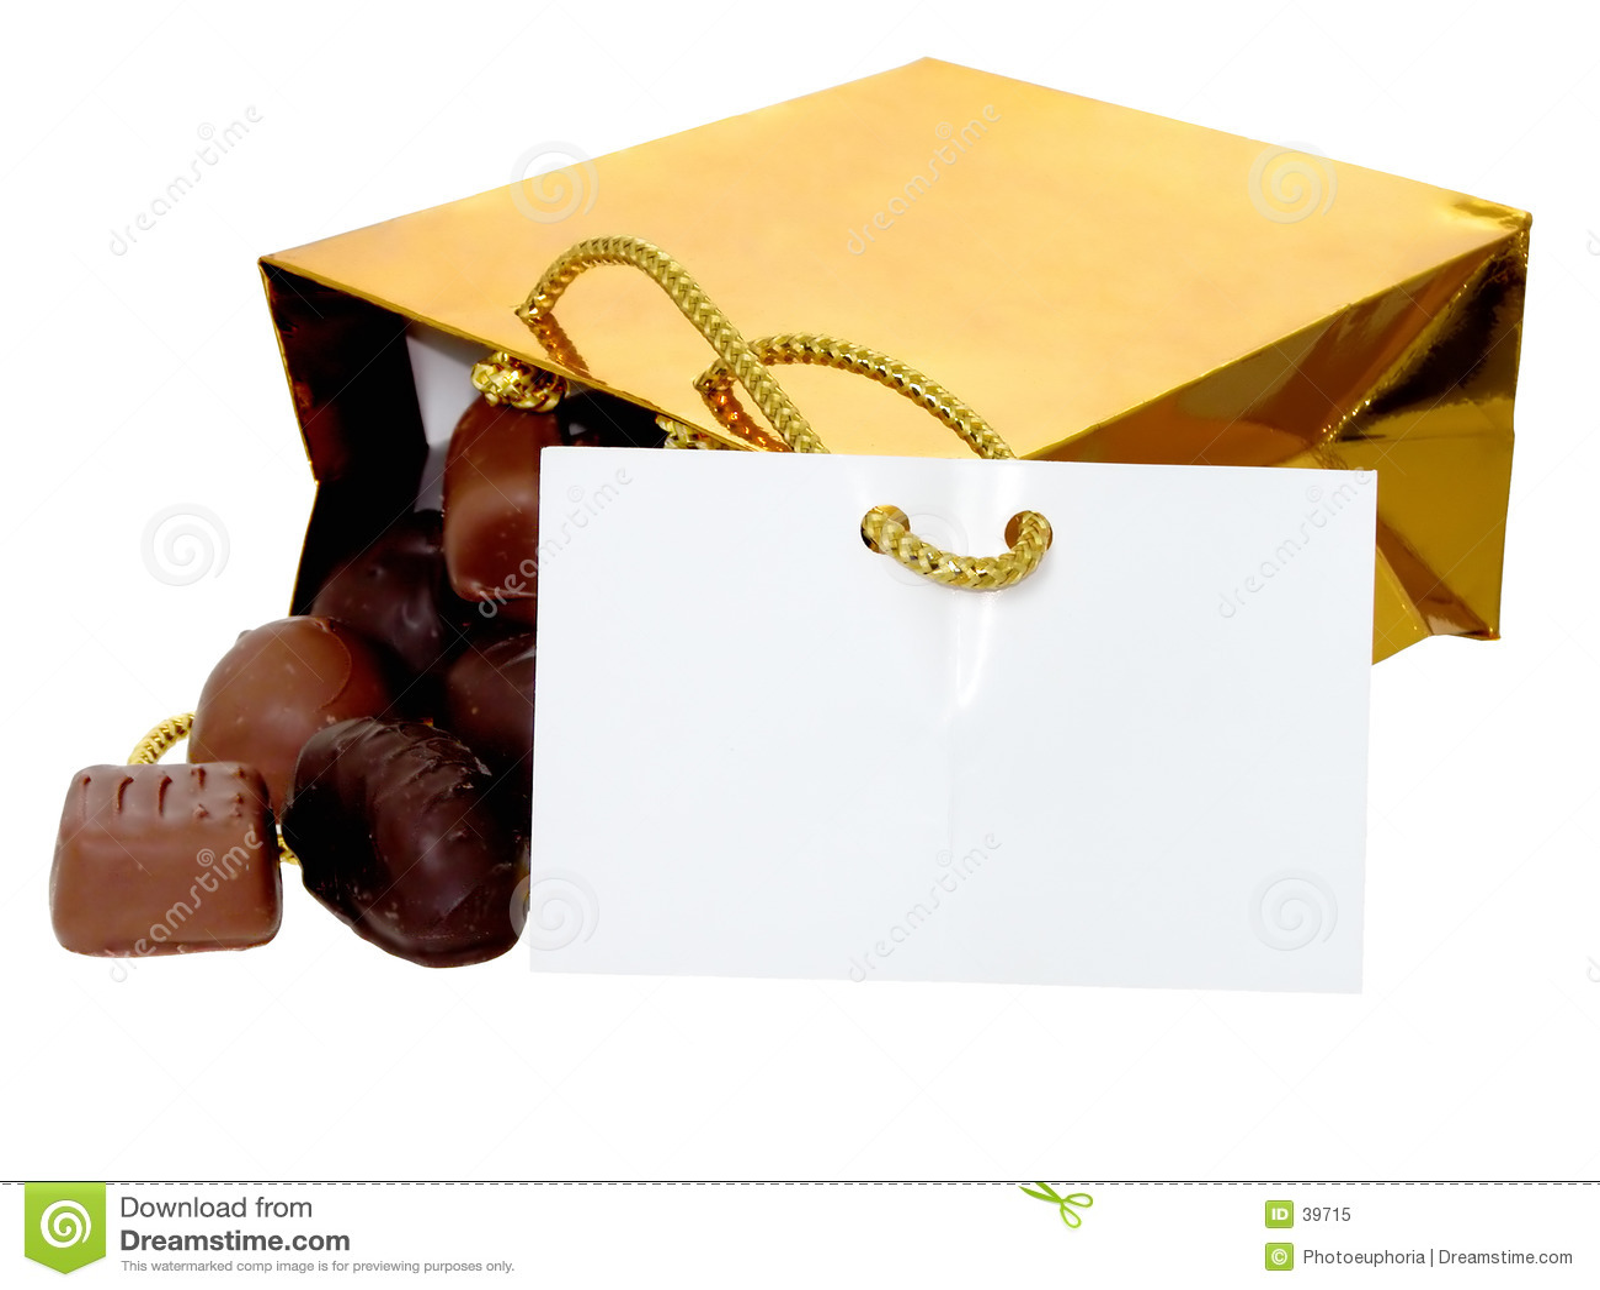 Adicione o texto a este saco dos chocolates